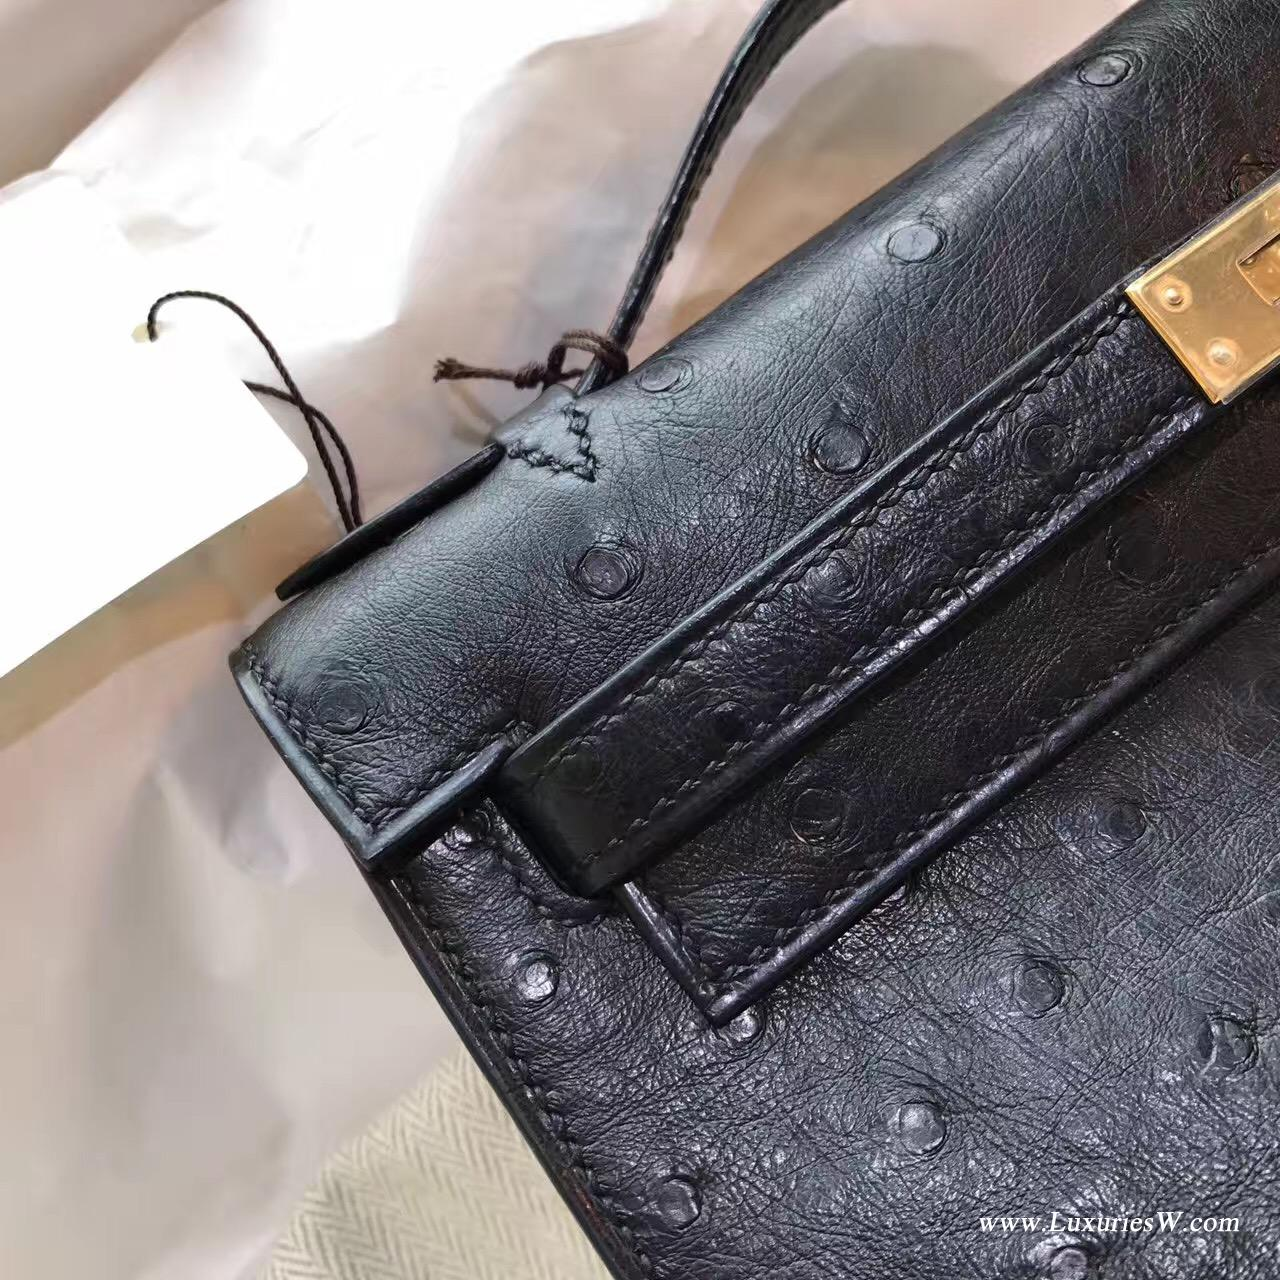 Hermes minikelly 一代 凯莉包 鸵鸟CK89 Nior黑色金色金属 街拍首选帅气十足